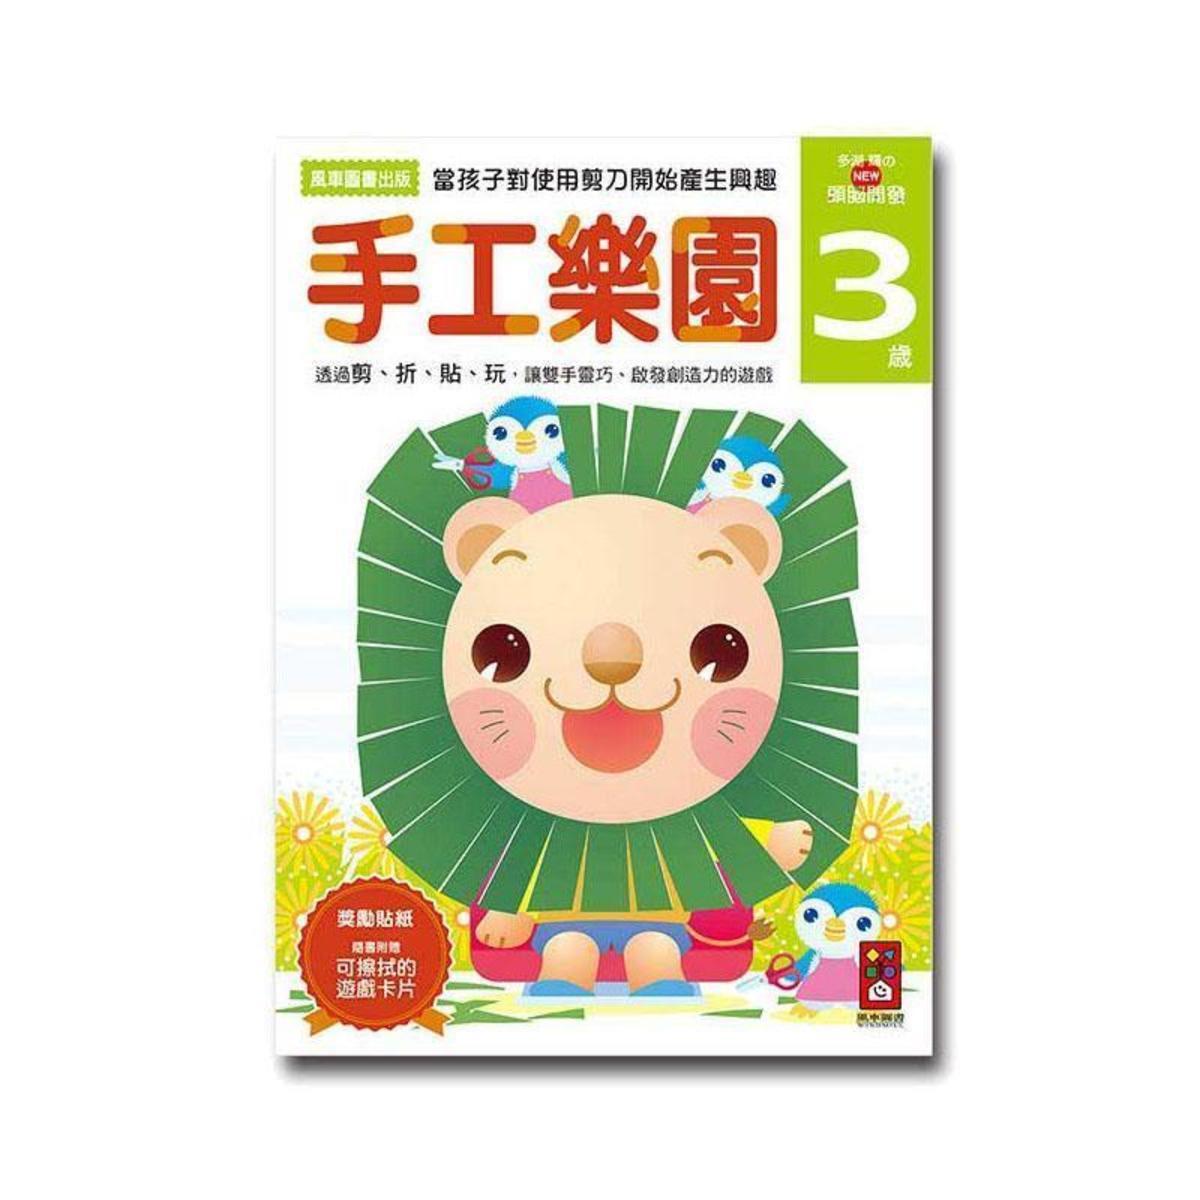 Publishing Manual Park 3 years old - Multi-Huhui's NEW Mind Development Taiwan Import